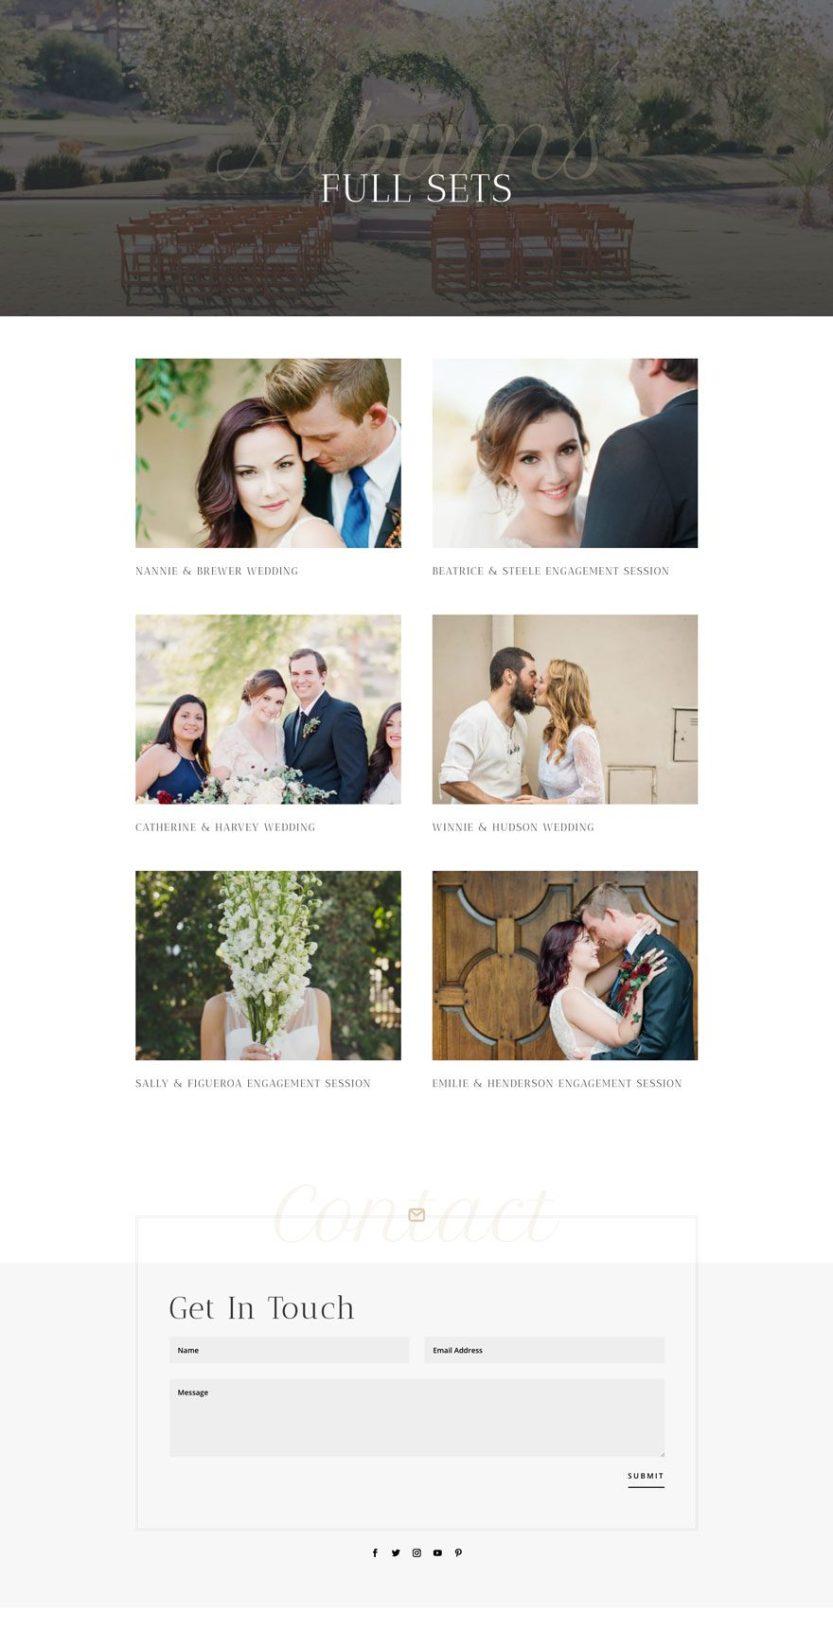 wedding photographer website